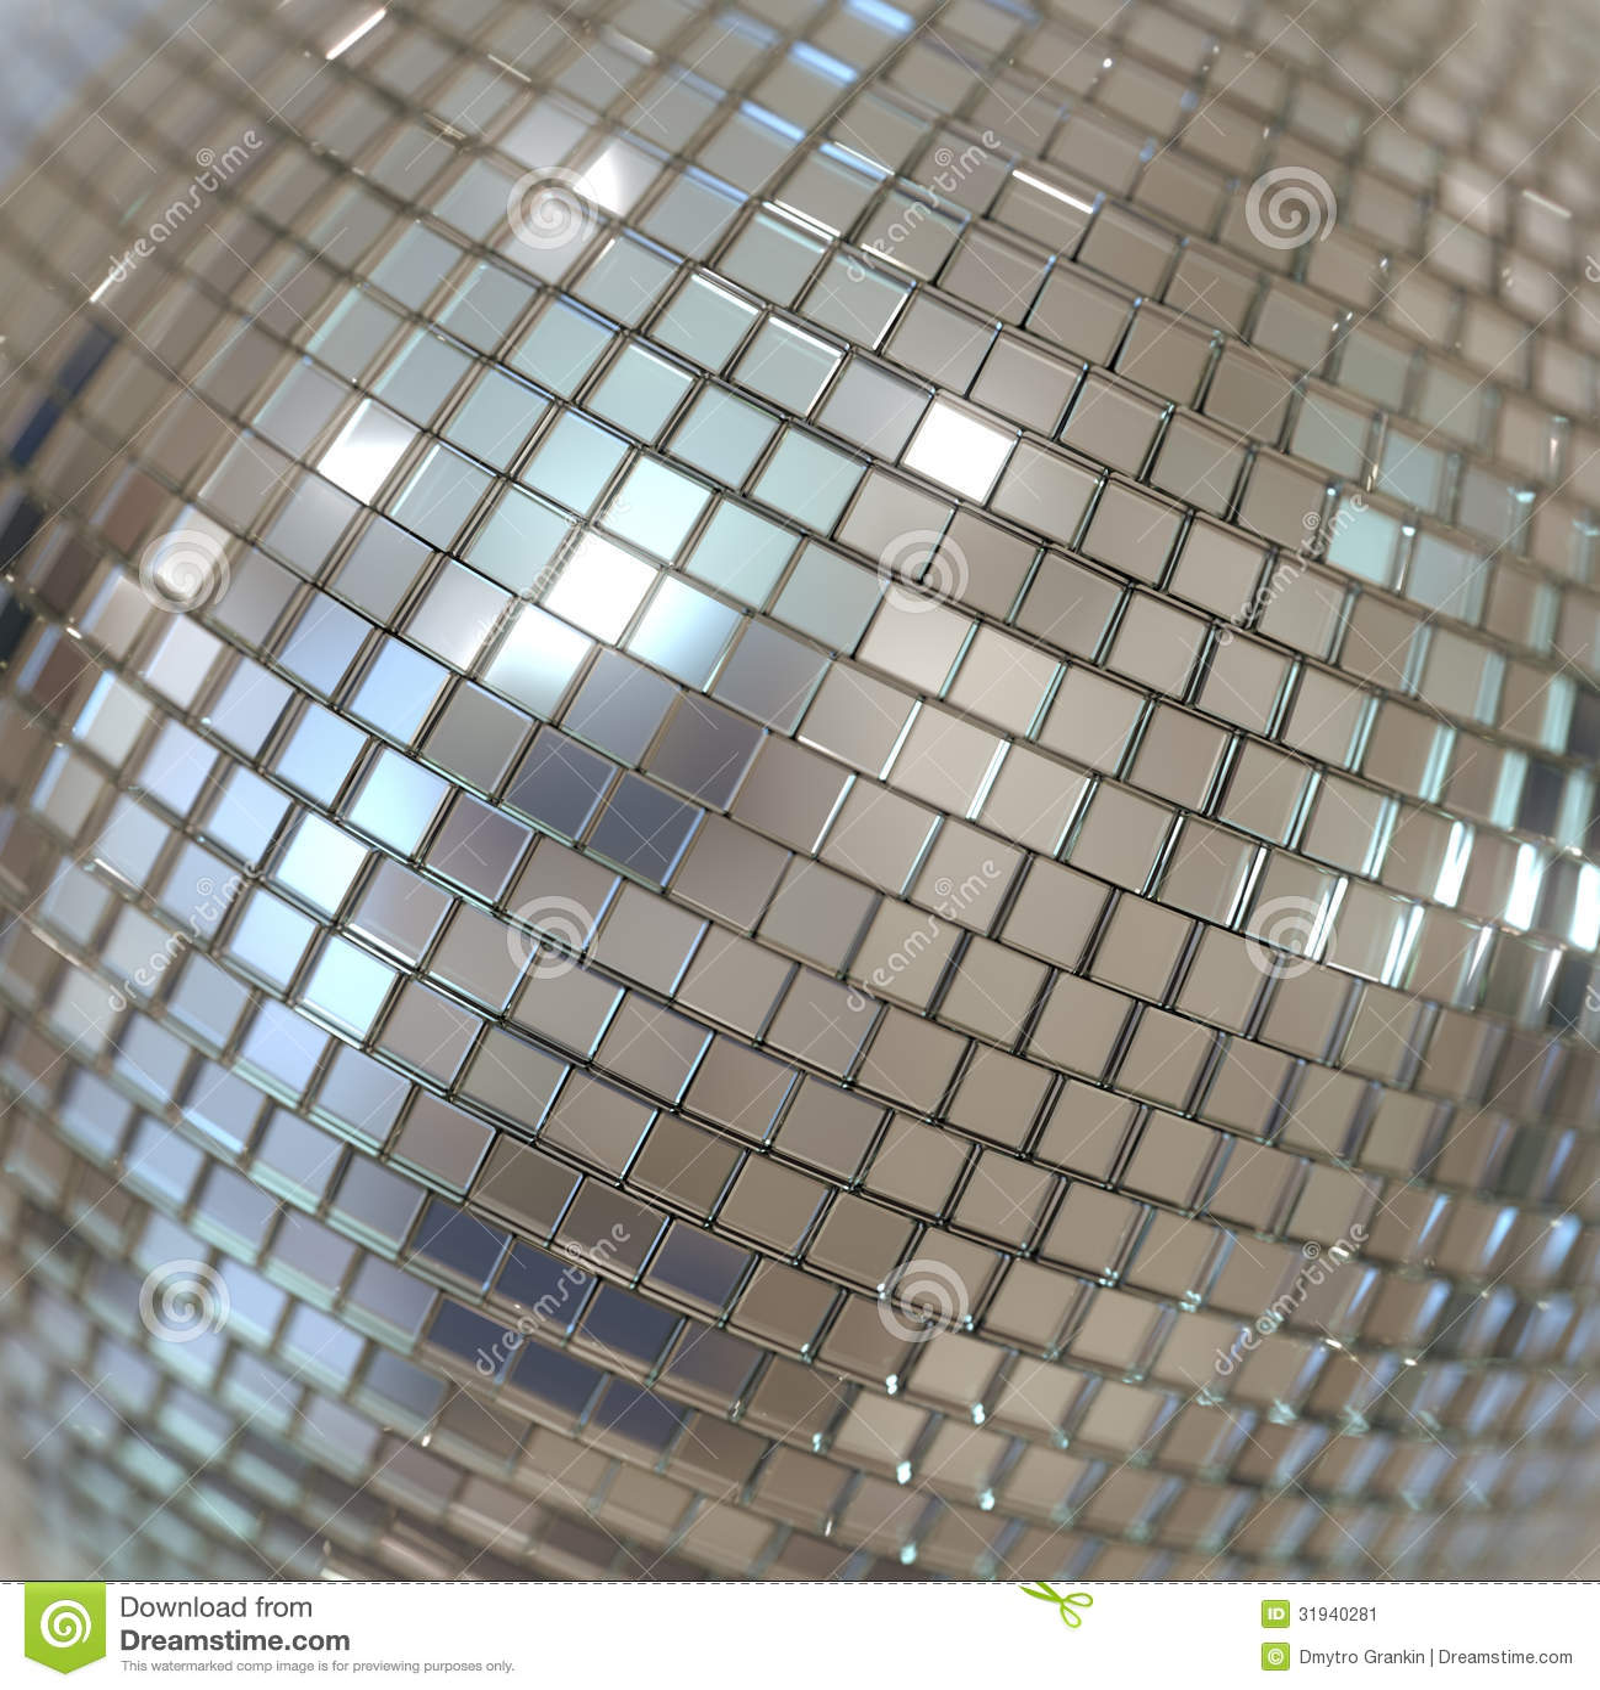 silver disco ball background - photo #7